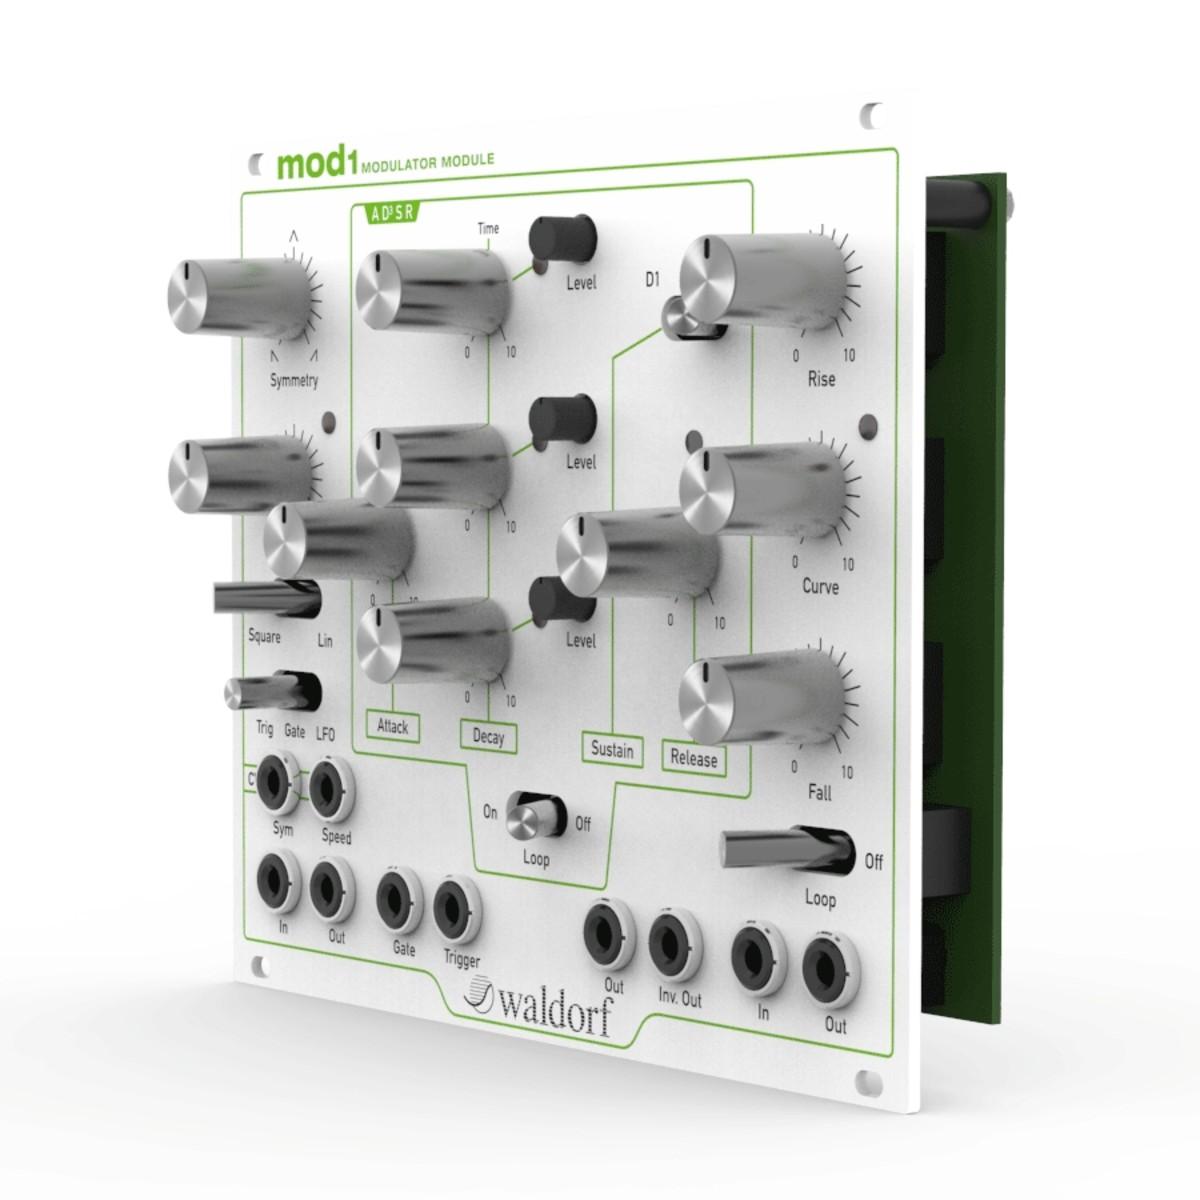 mod1 - Modulator Eurorack